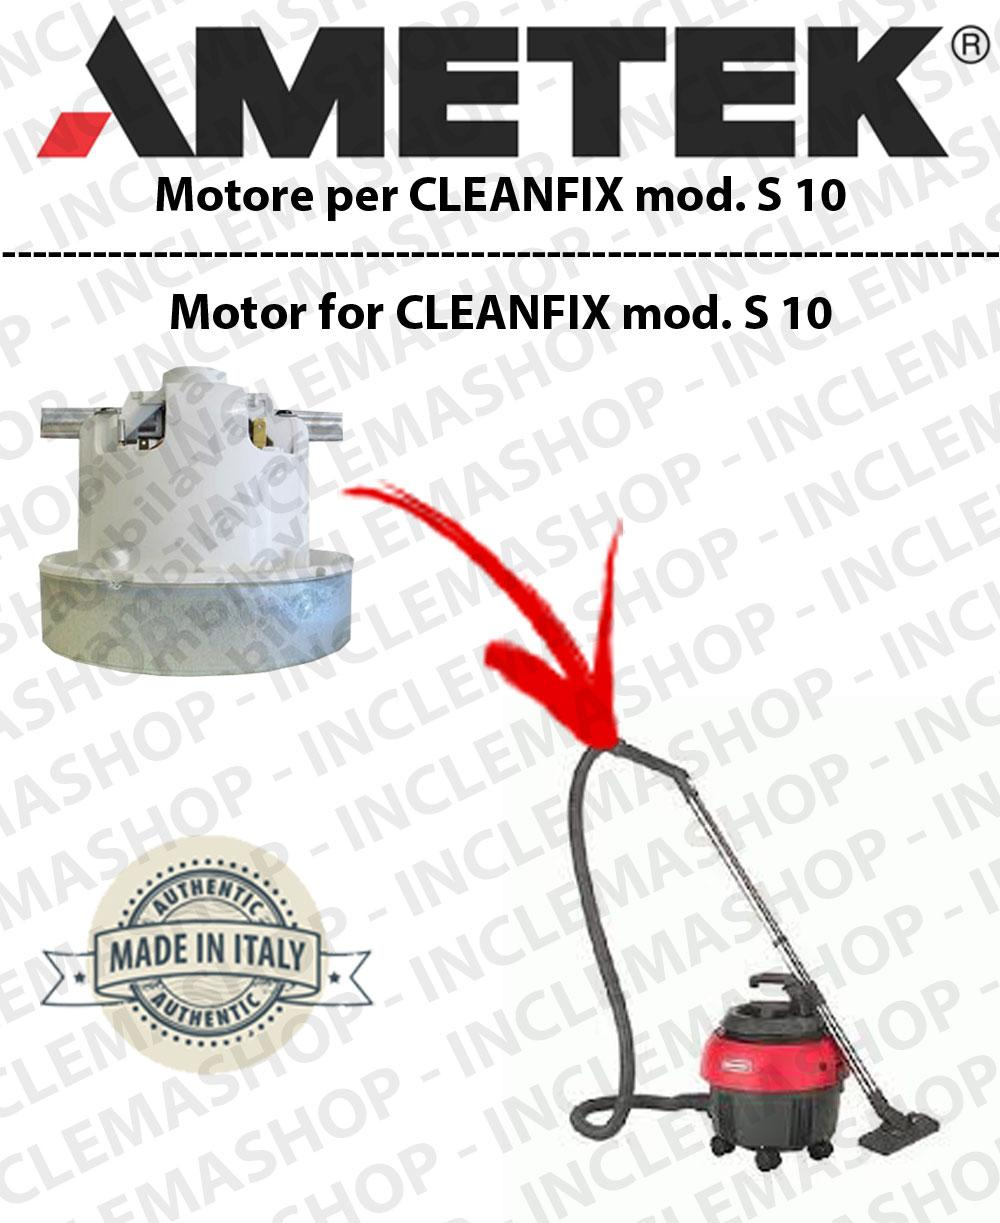 S 10 Saugmotor AMETEK für Staubsauger CLEANFIX